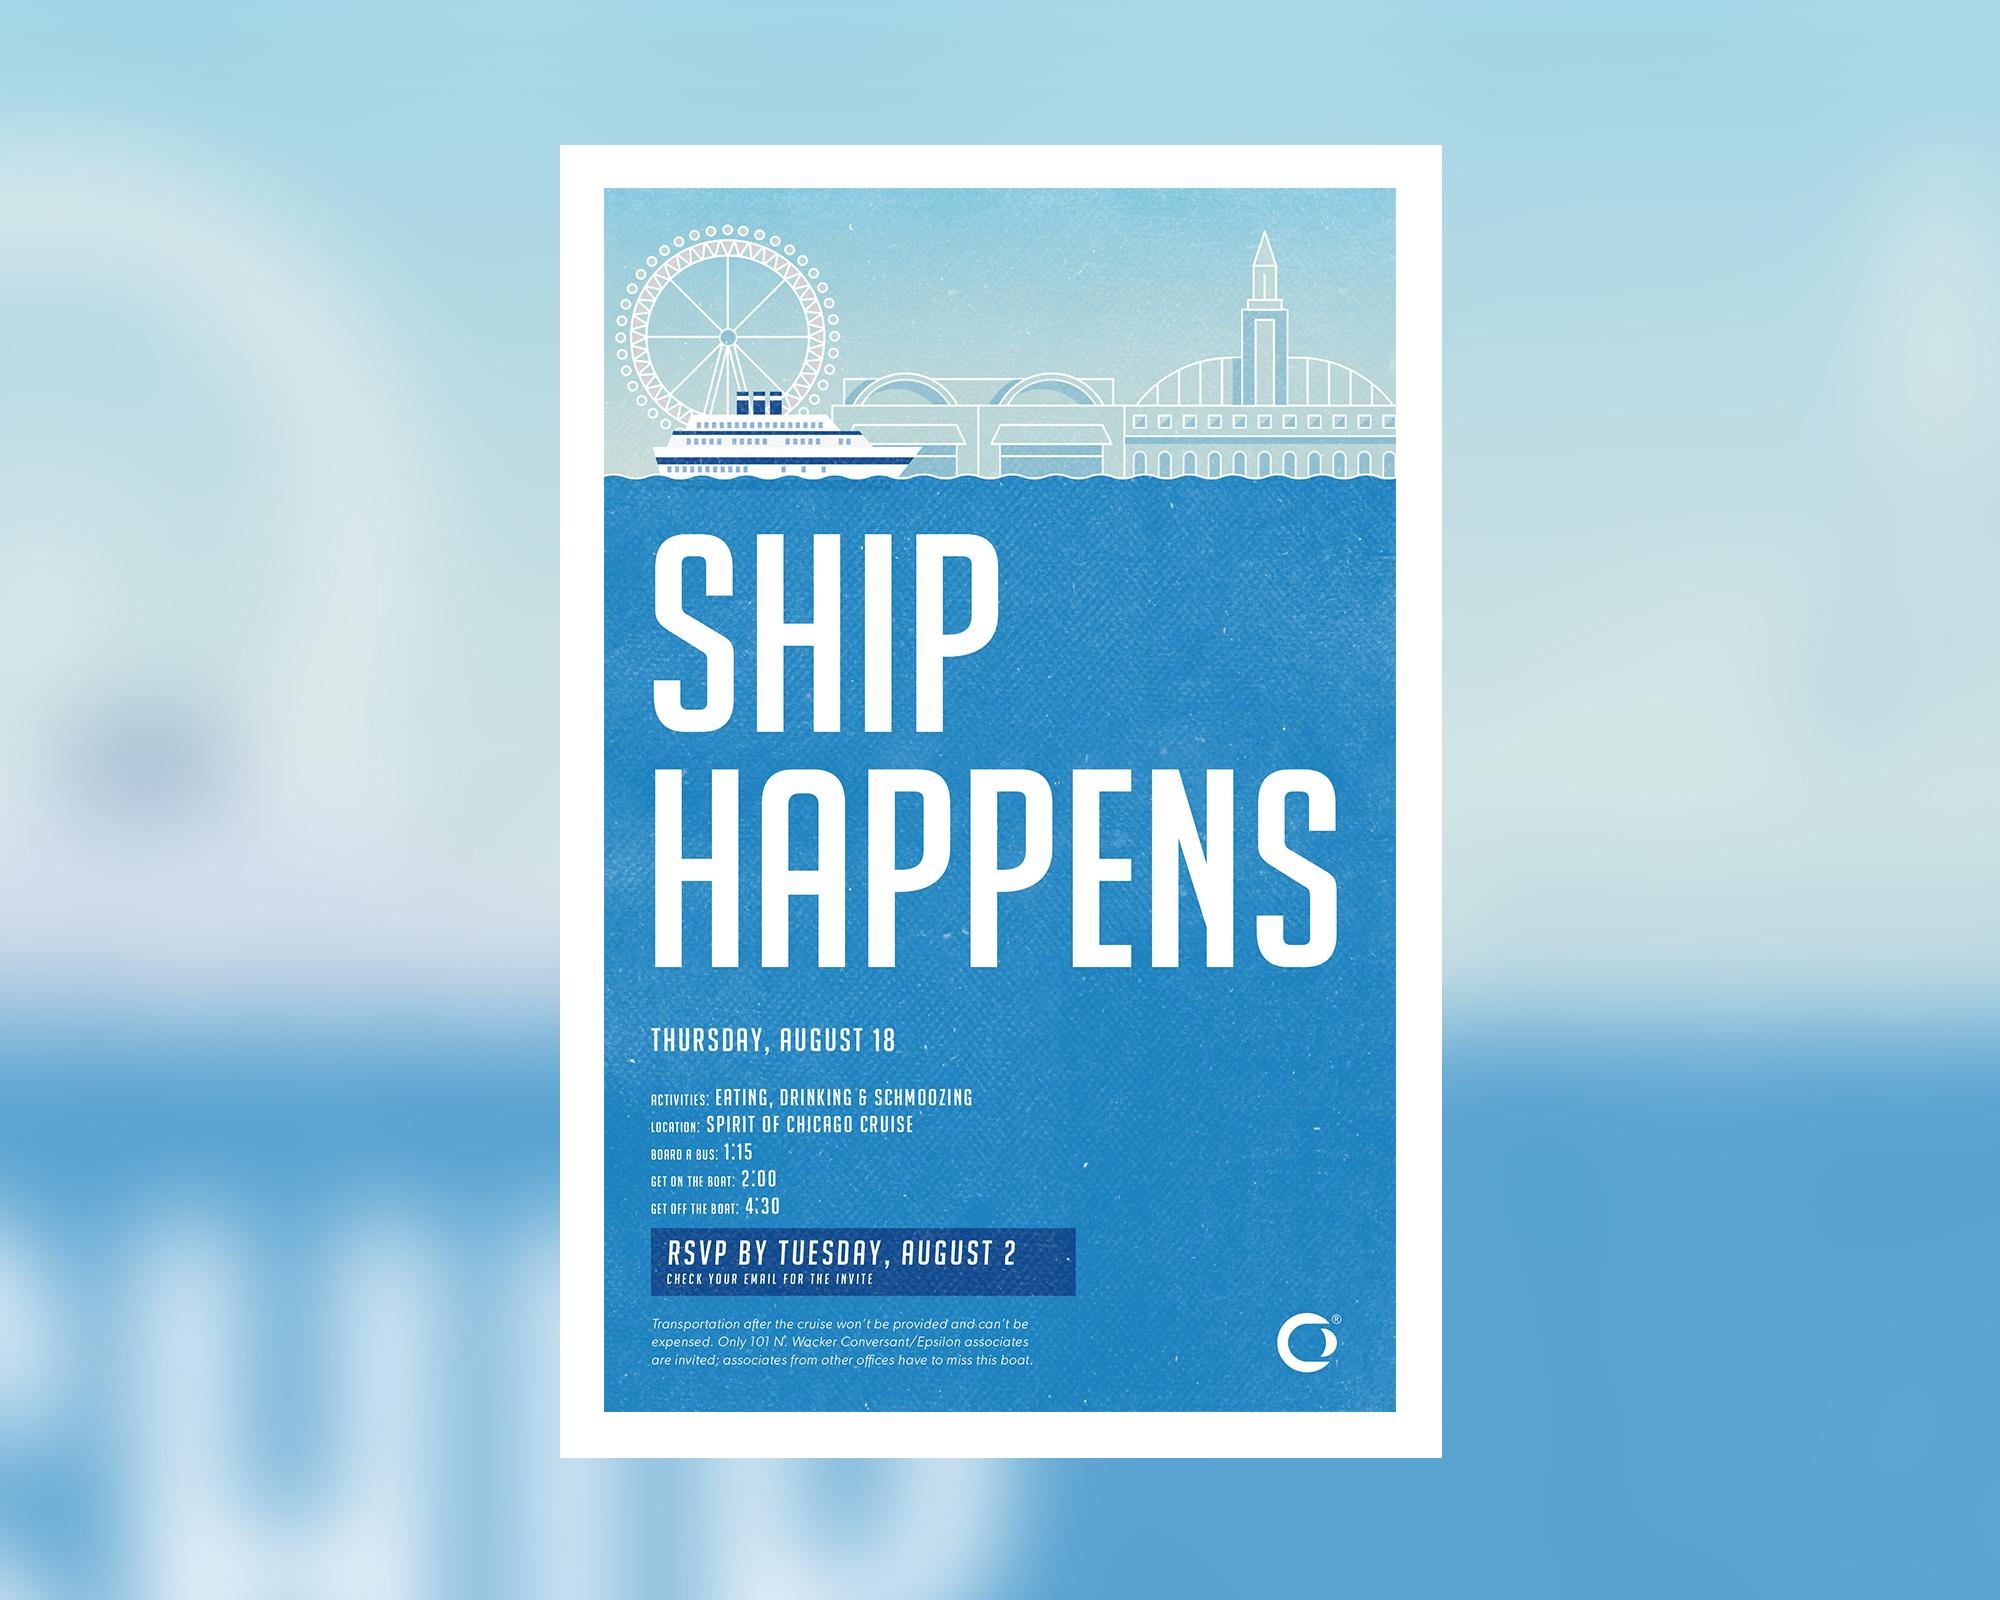 ShipHappens_ChicagoPosterArt.jpg